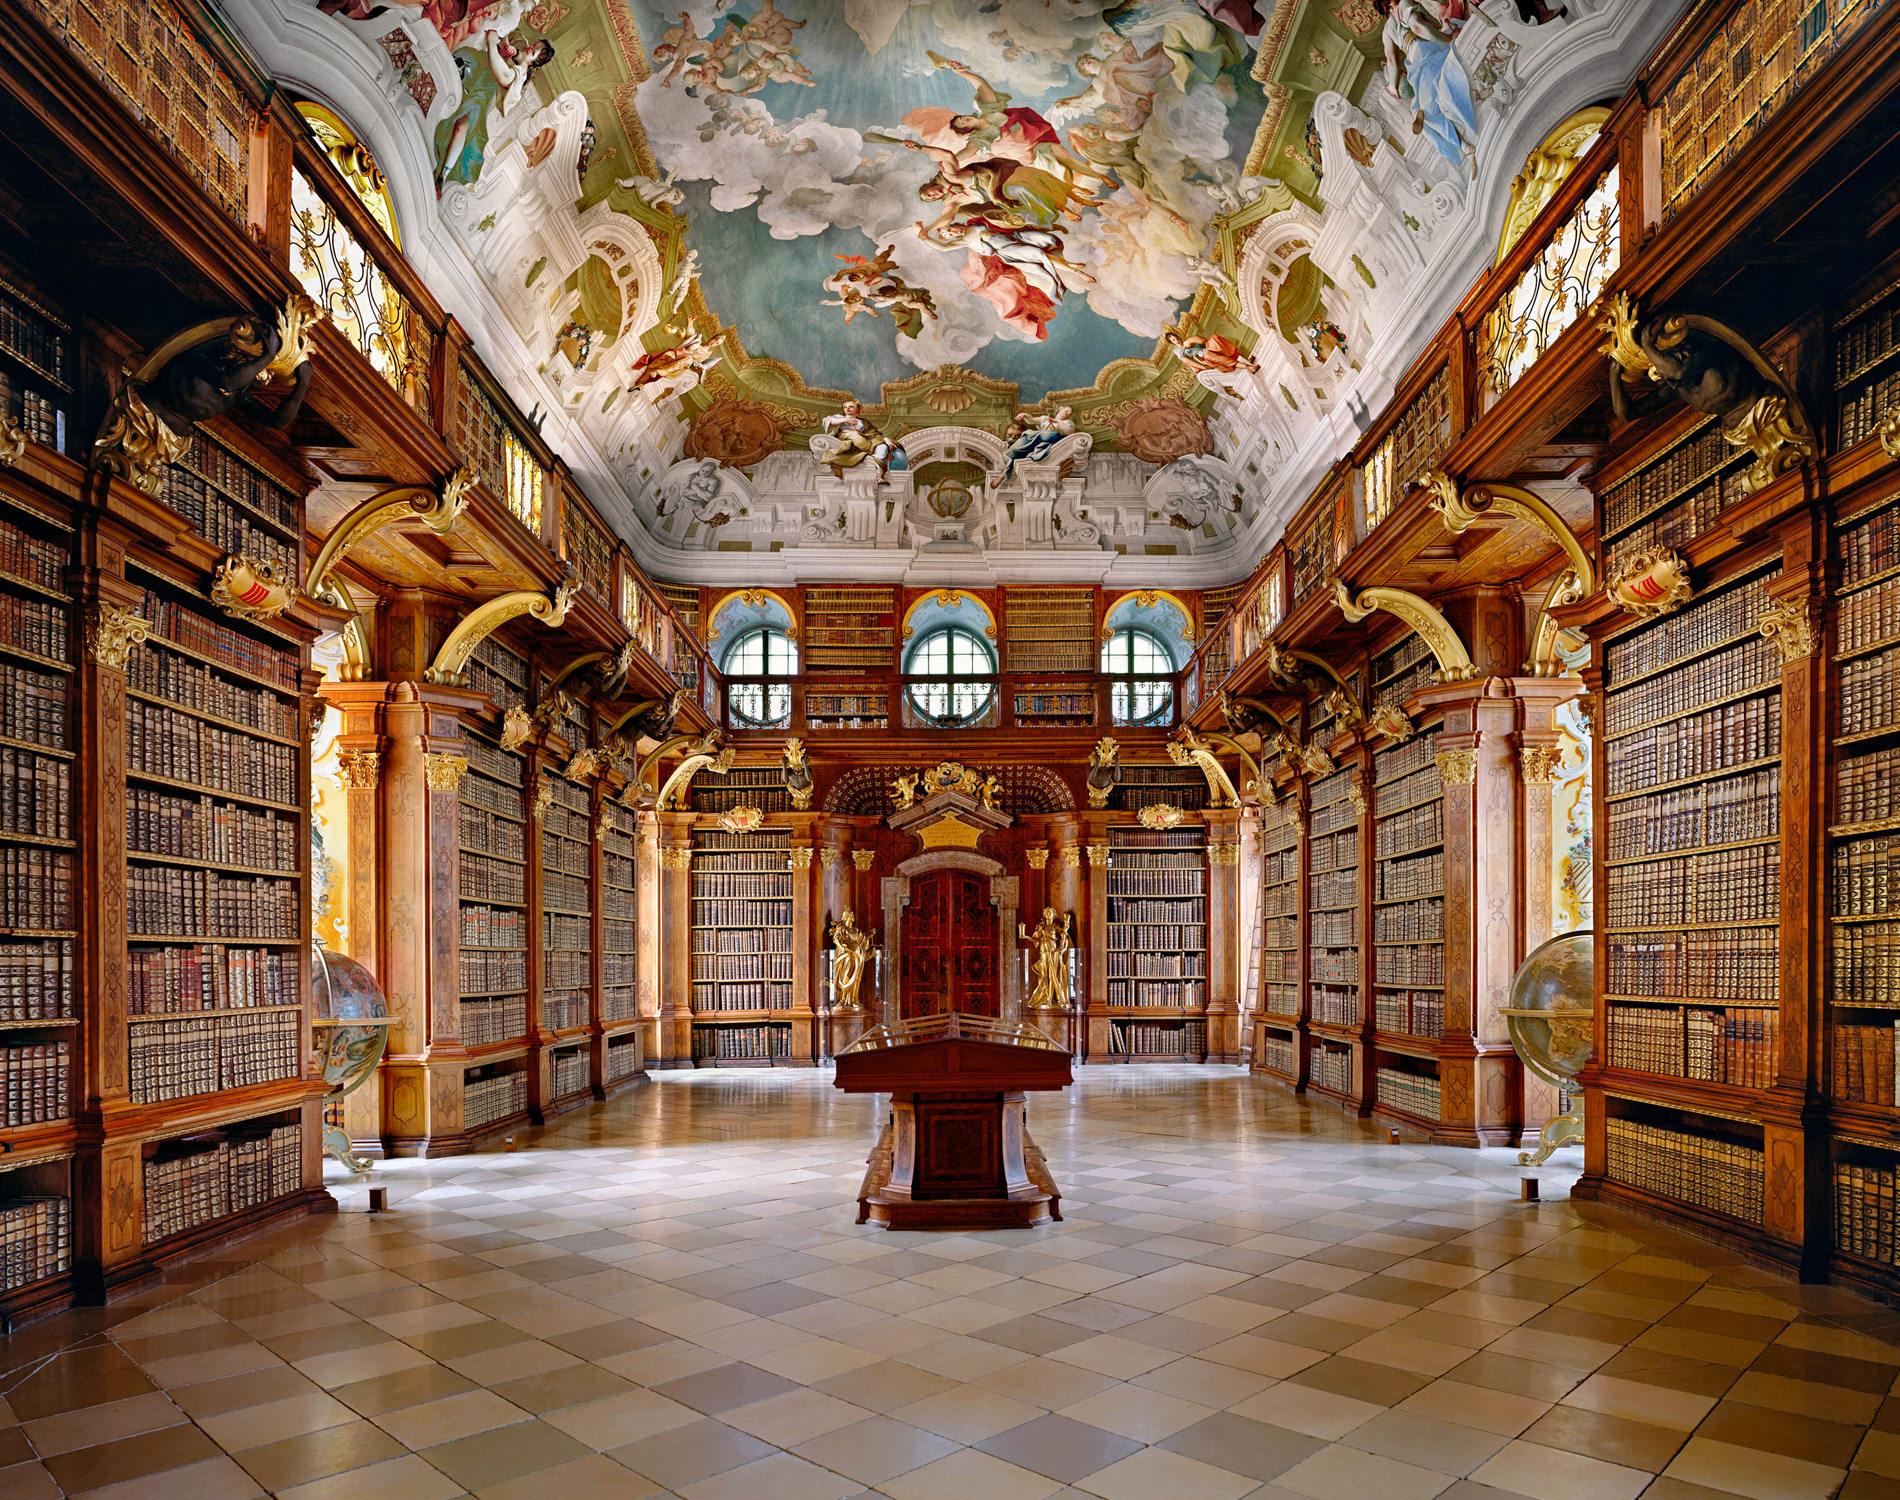 Ahmet Ertug — Bibliothèque de l'Abbaye de Melk, Autriche